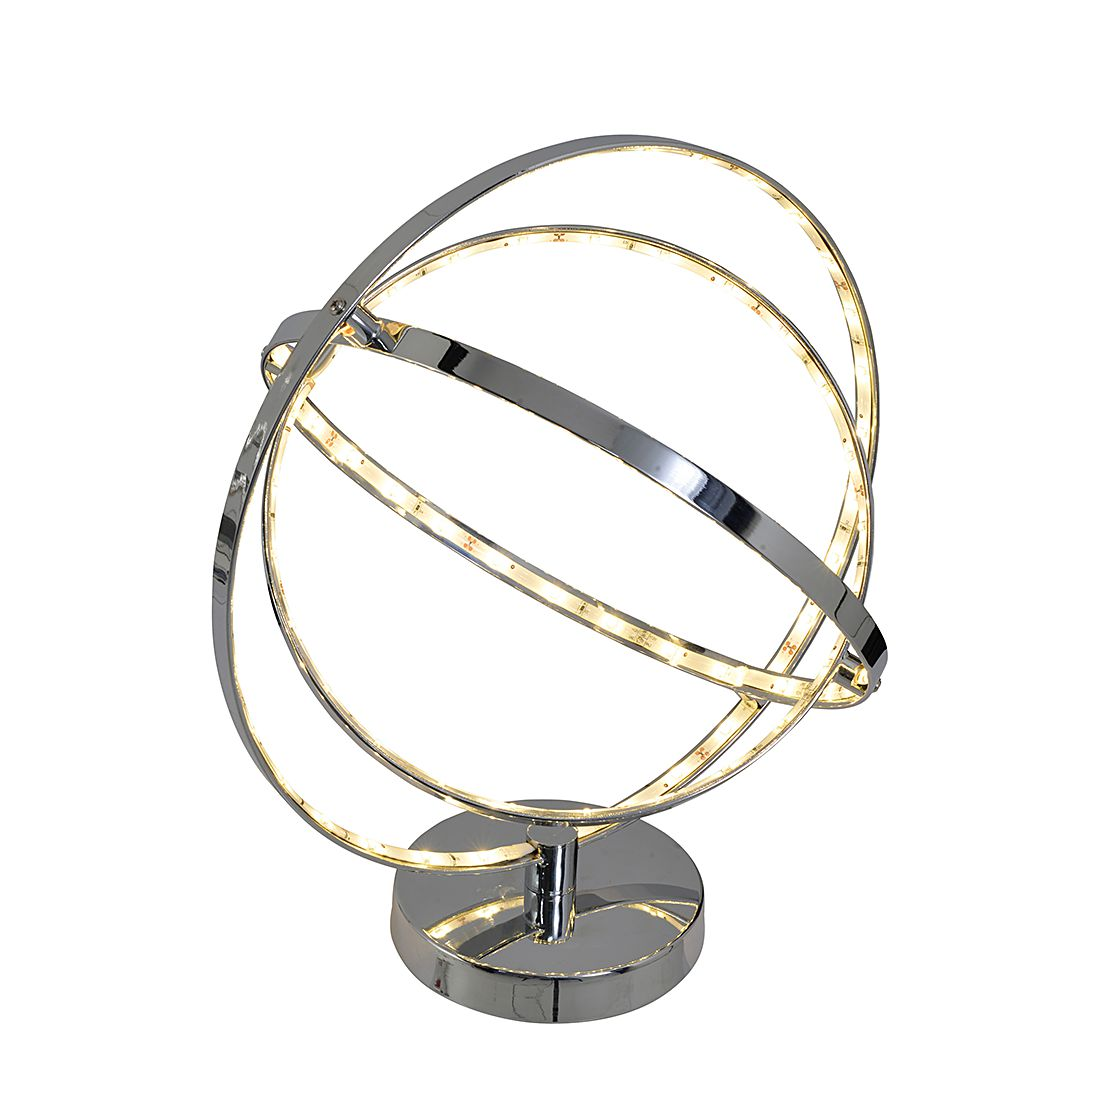 home24 Näve Tischleuchte LED Modern Chrom Metall 87-flammig 31x39x35 cm (BxHxT)